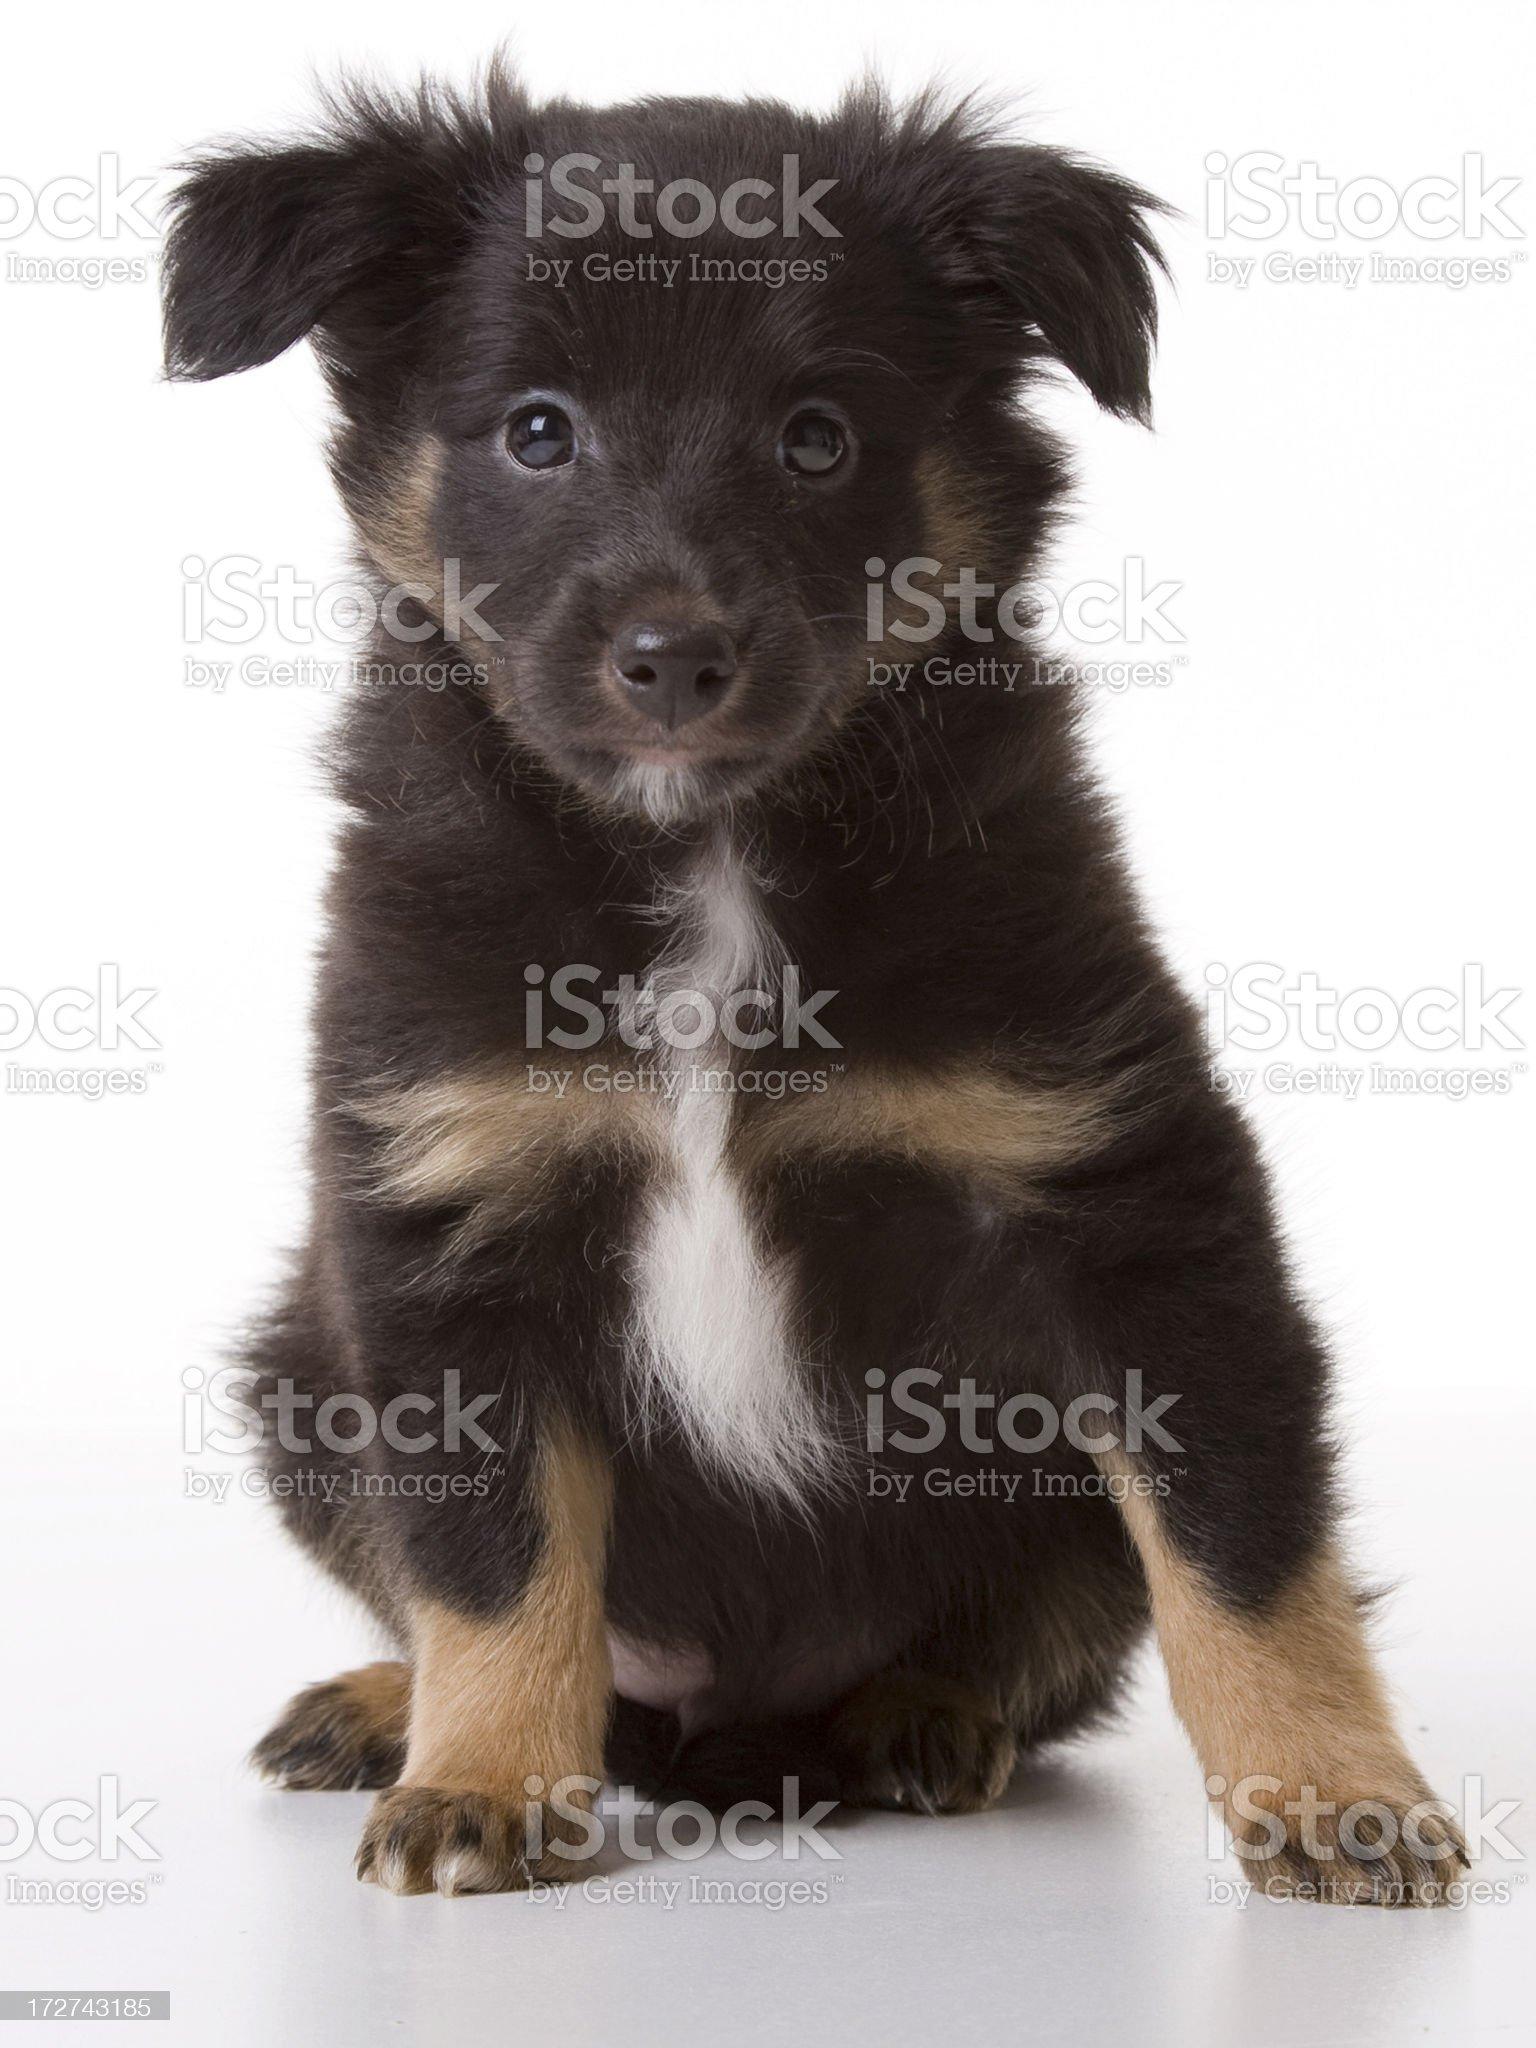 Black puppy looking at camera royalty-free stock photo